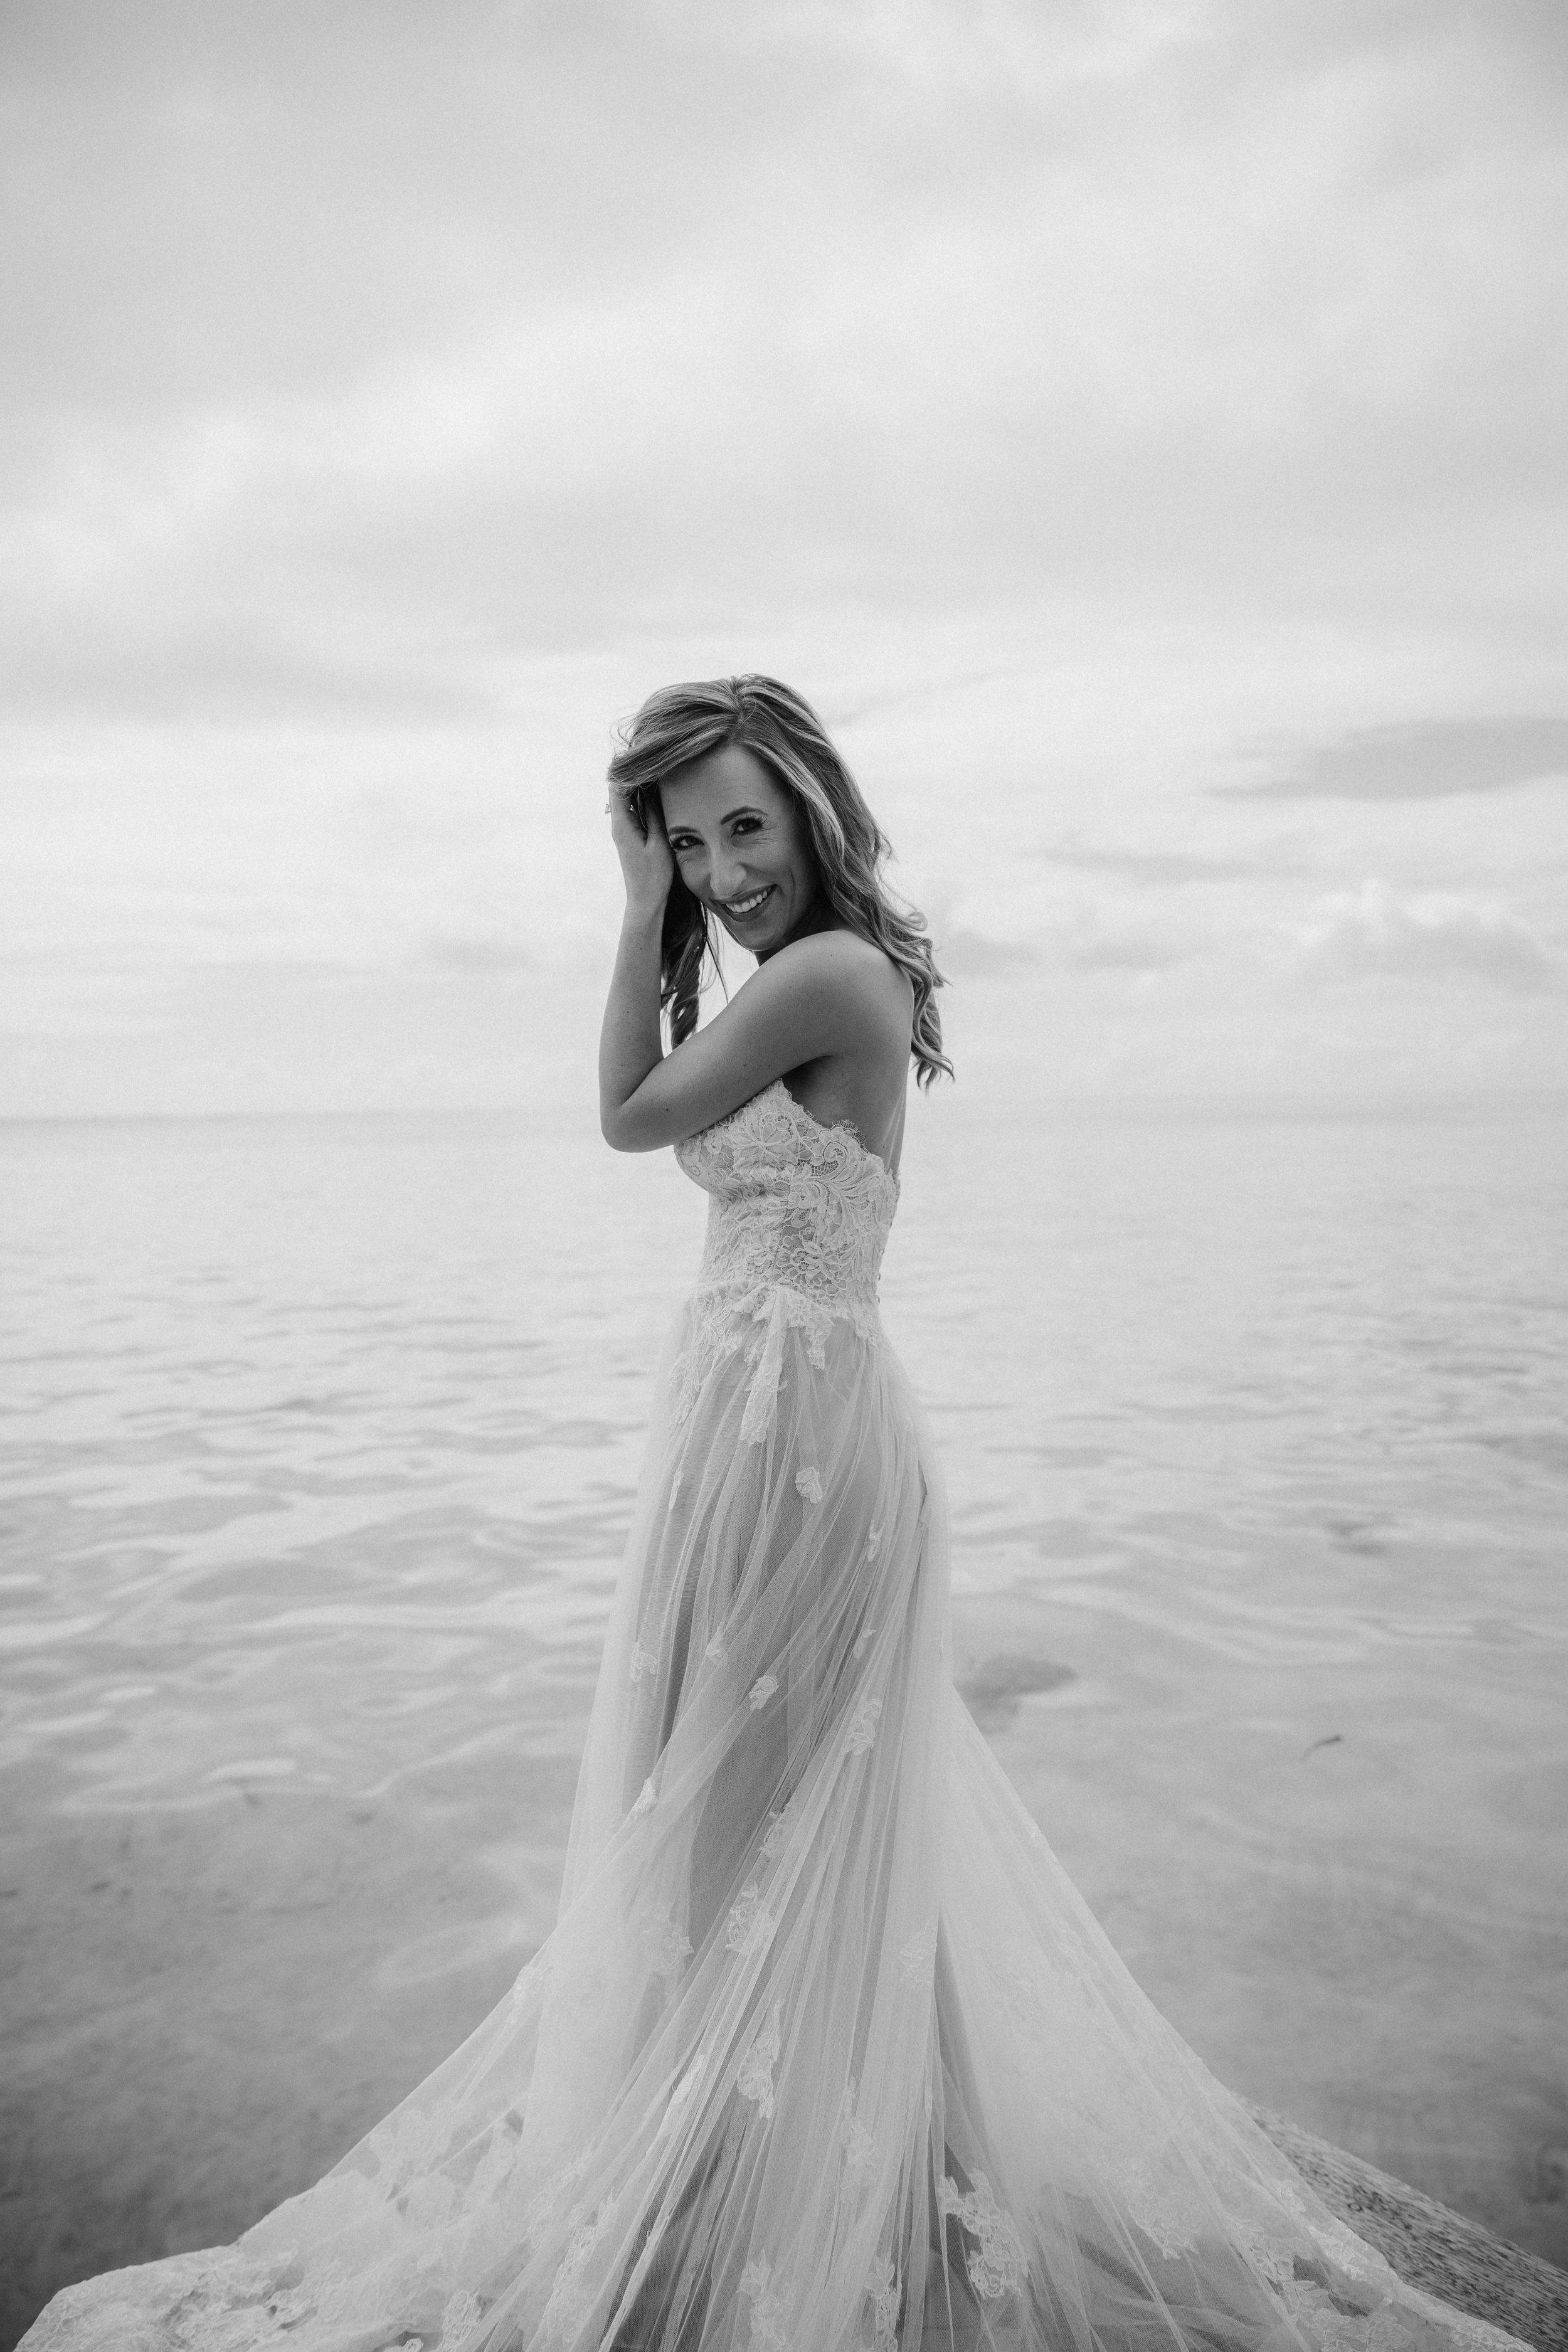 JonathanBurkhart_Moorea_Wedding_Oklahoma_7Q6A5027.jpg